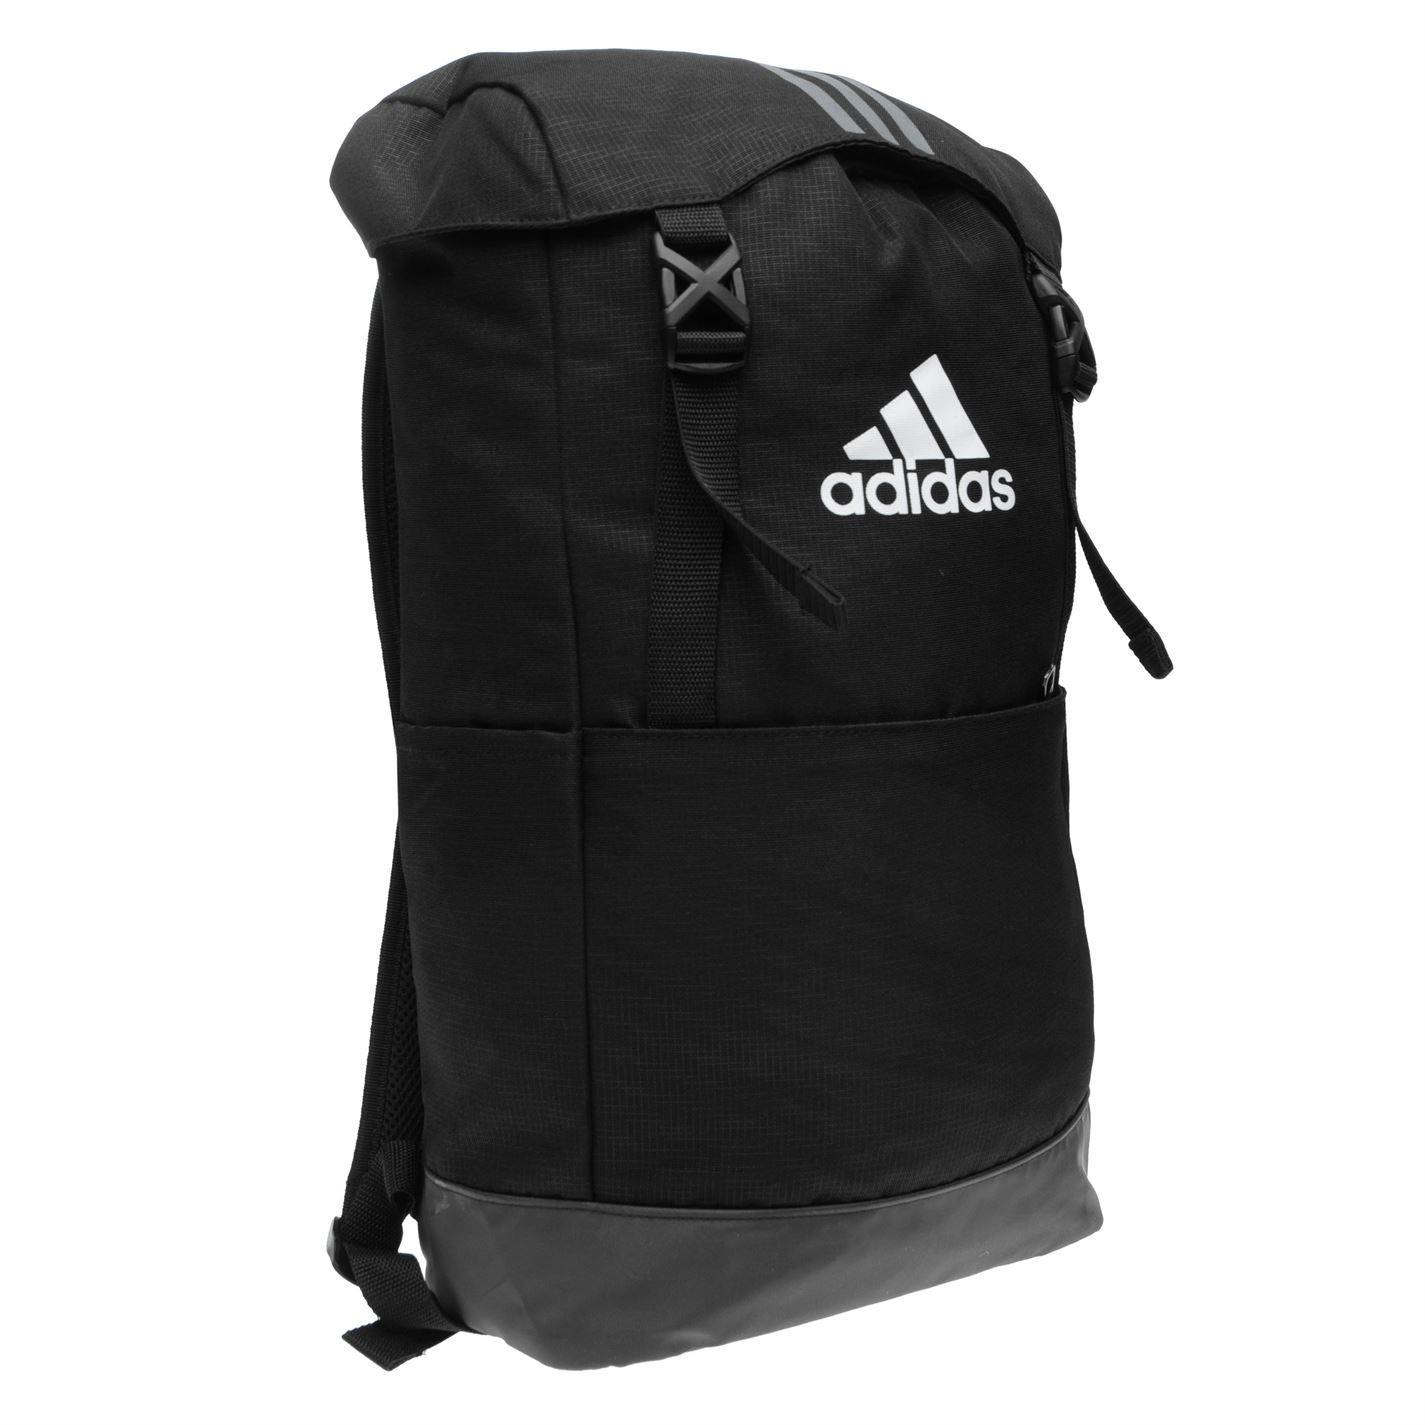 667977f08e21 ... adidas 3 Stripe Performance Backpack Black Wht Sports Gym Bag Rucksack  Carryall ...